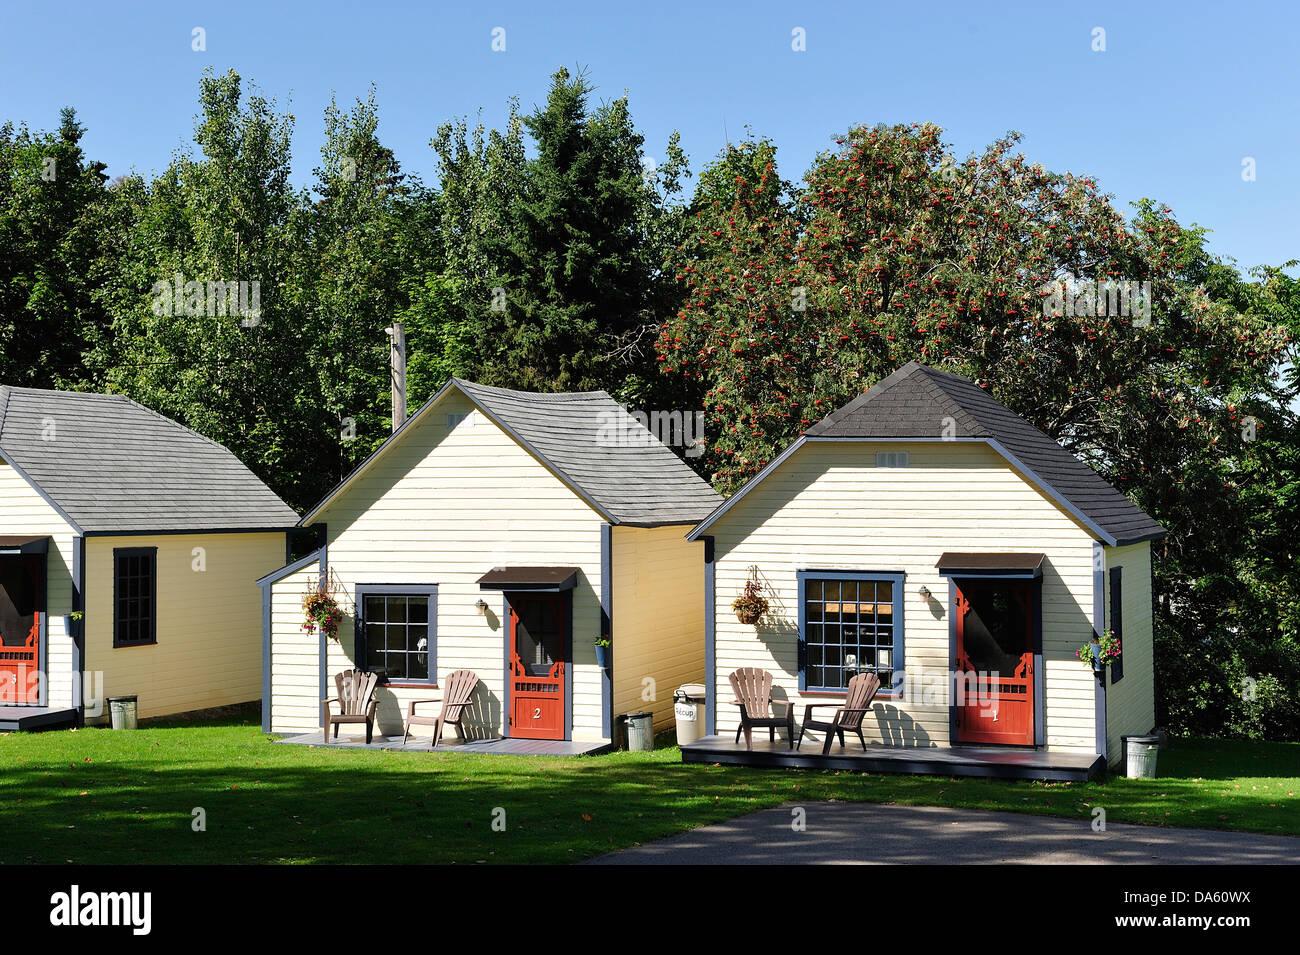 Cabins Canada Motel Rimouski Barn Farm Houses